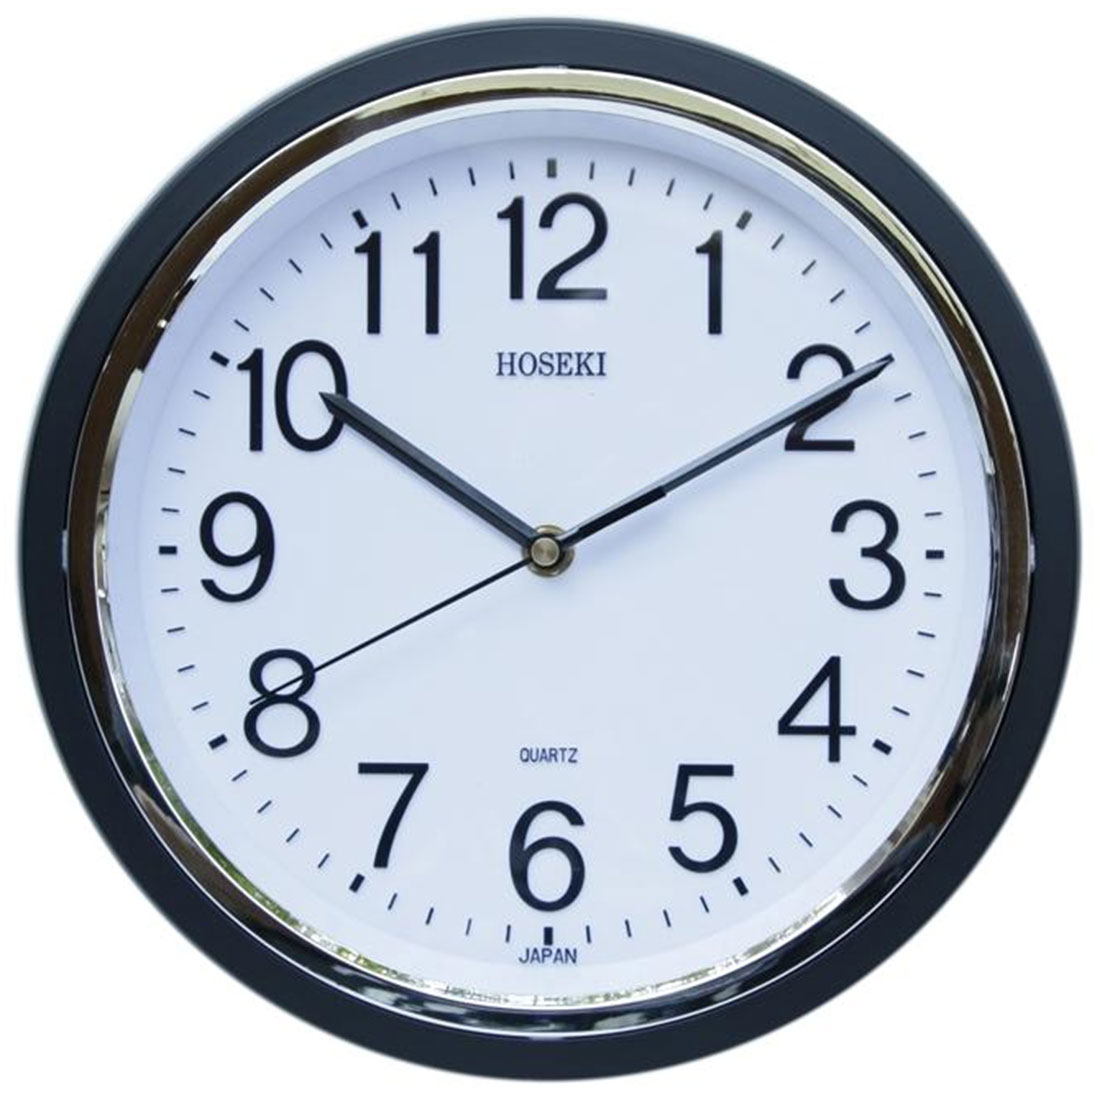 Hoseki Japan Quartz Black Round Analog Decor Wall Clock H-9148BL H-9148